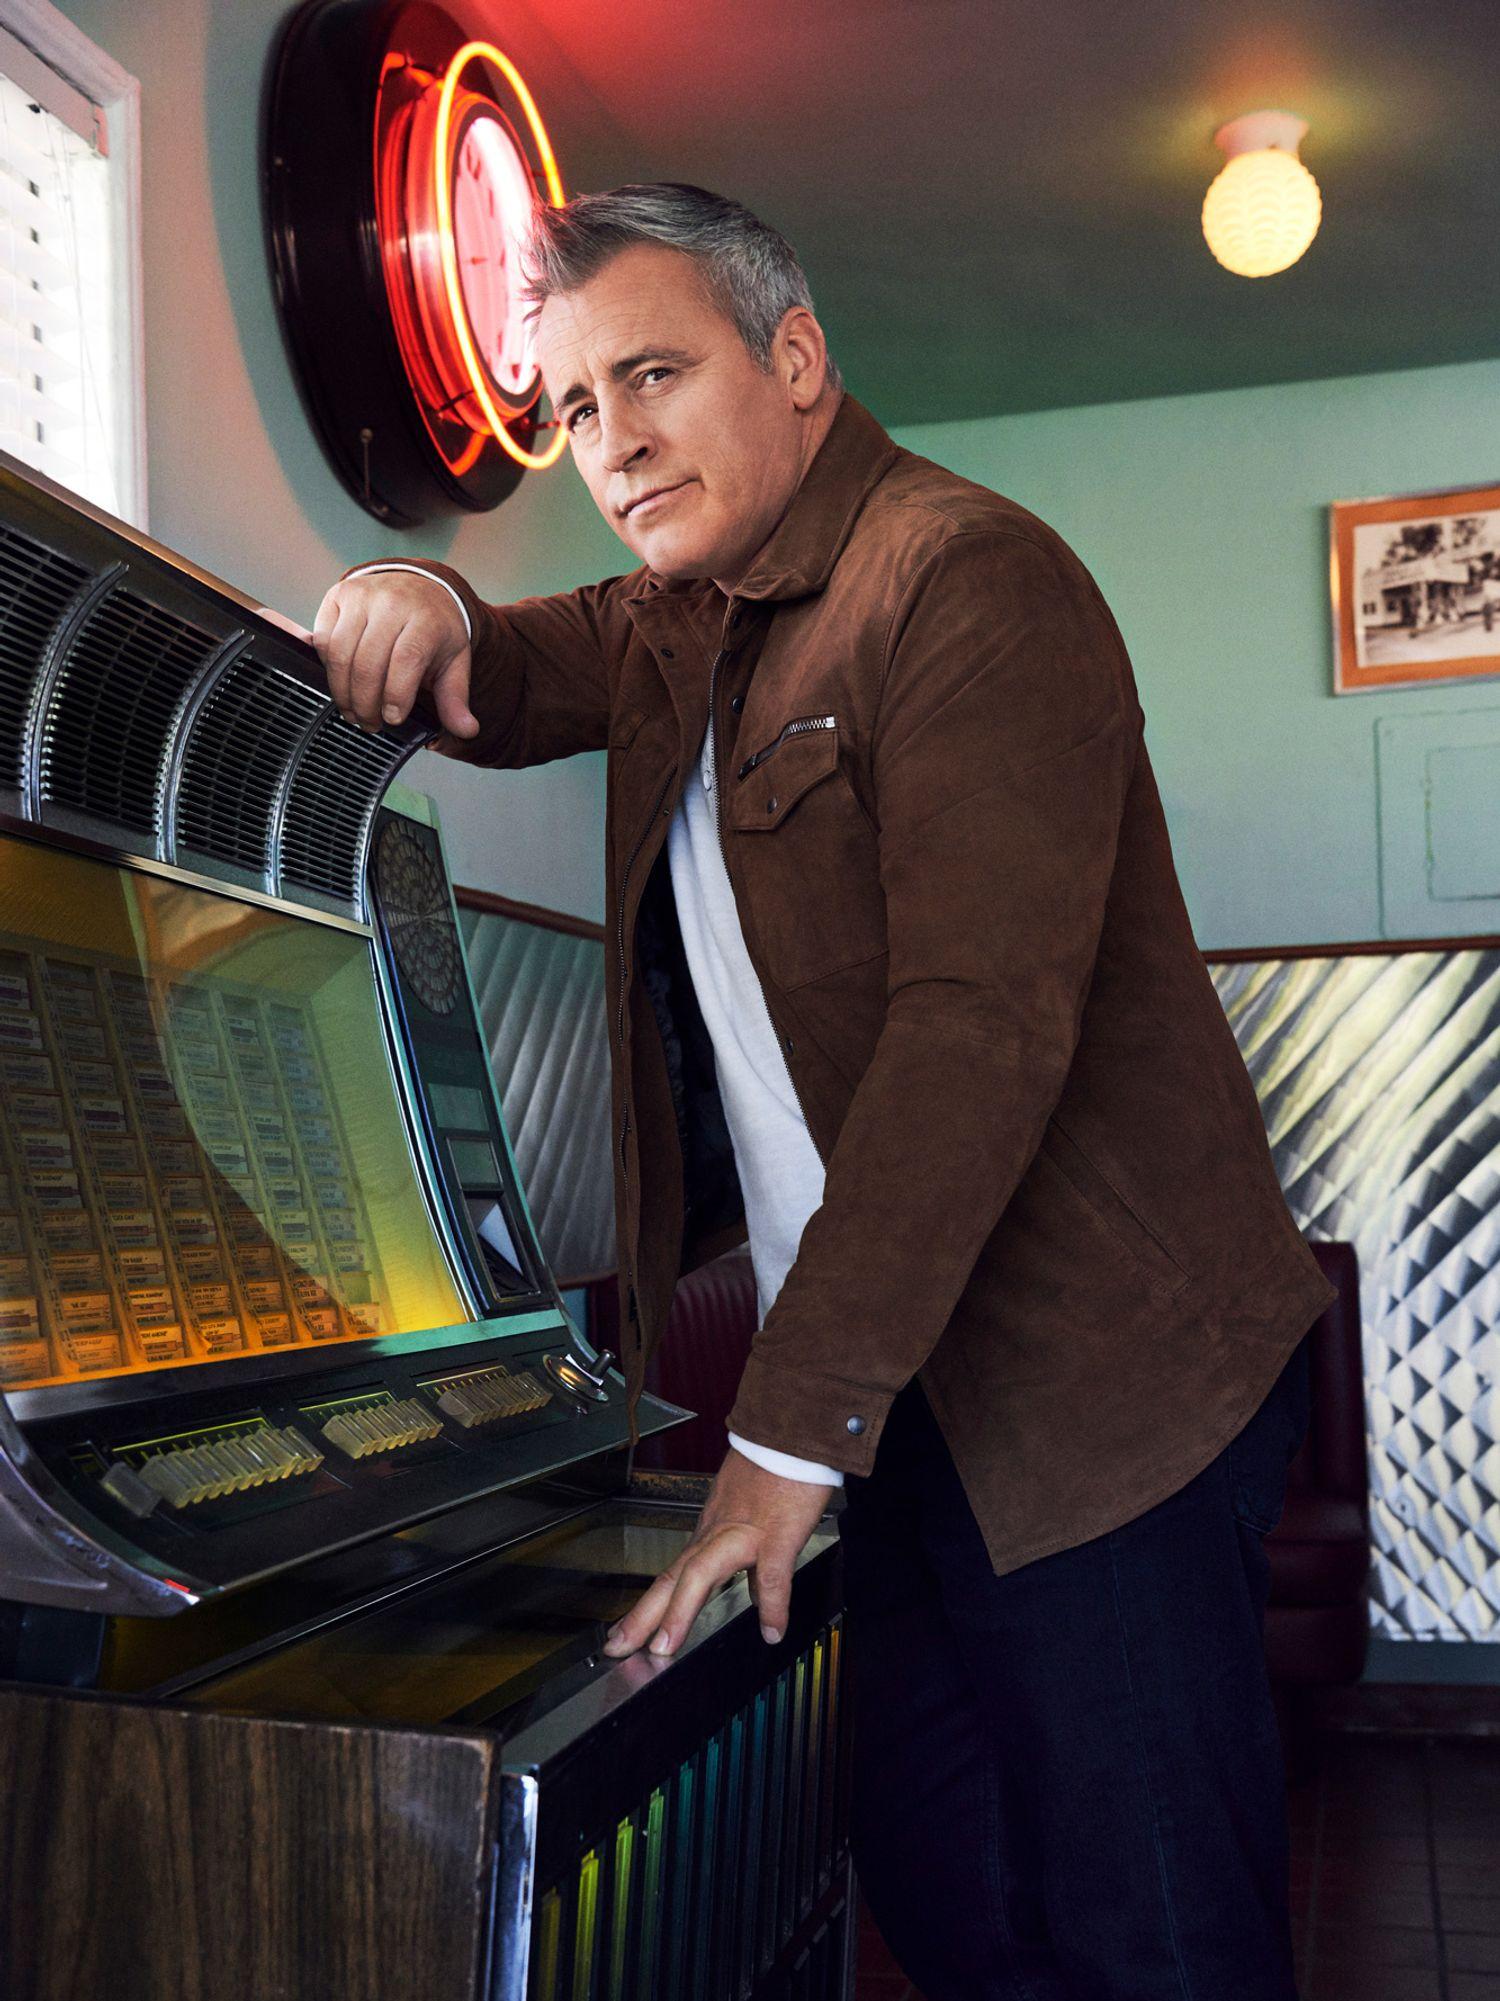 Actor Matt LeBlanc standing at a vintage juke box.